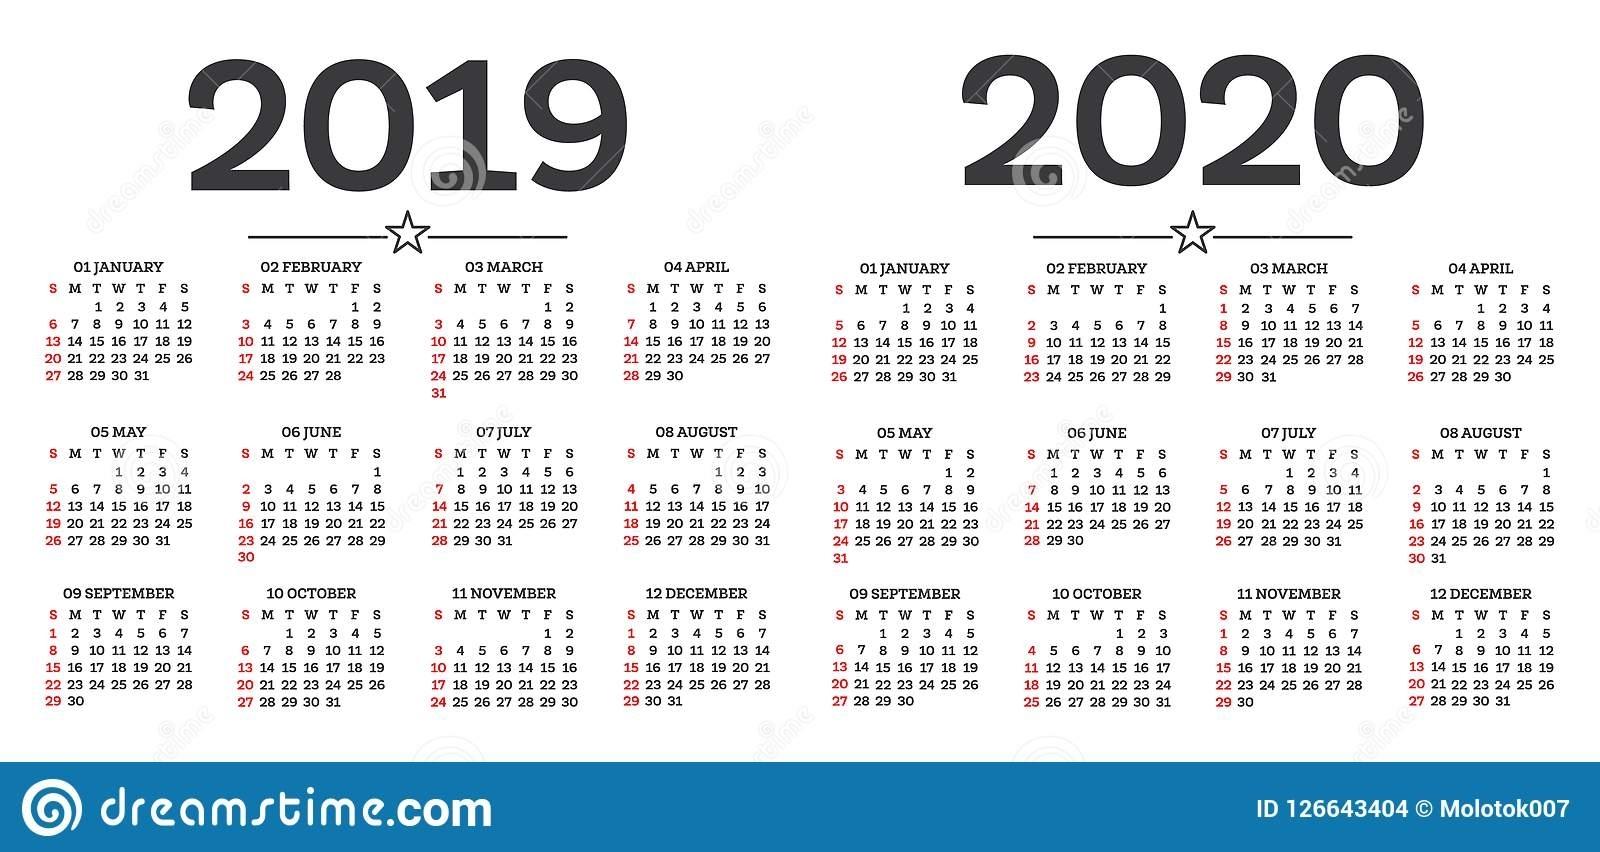 Calendar 2019 2020 Isolated On White Background. Week Starts